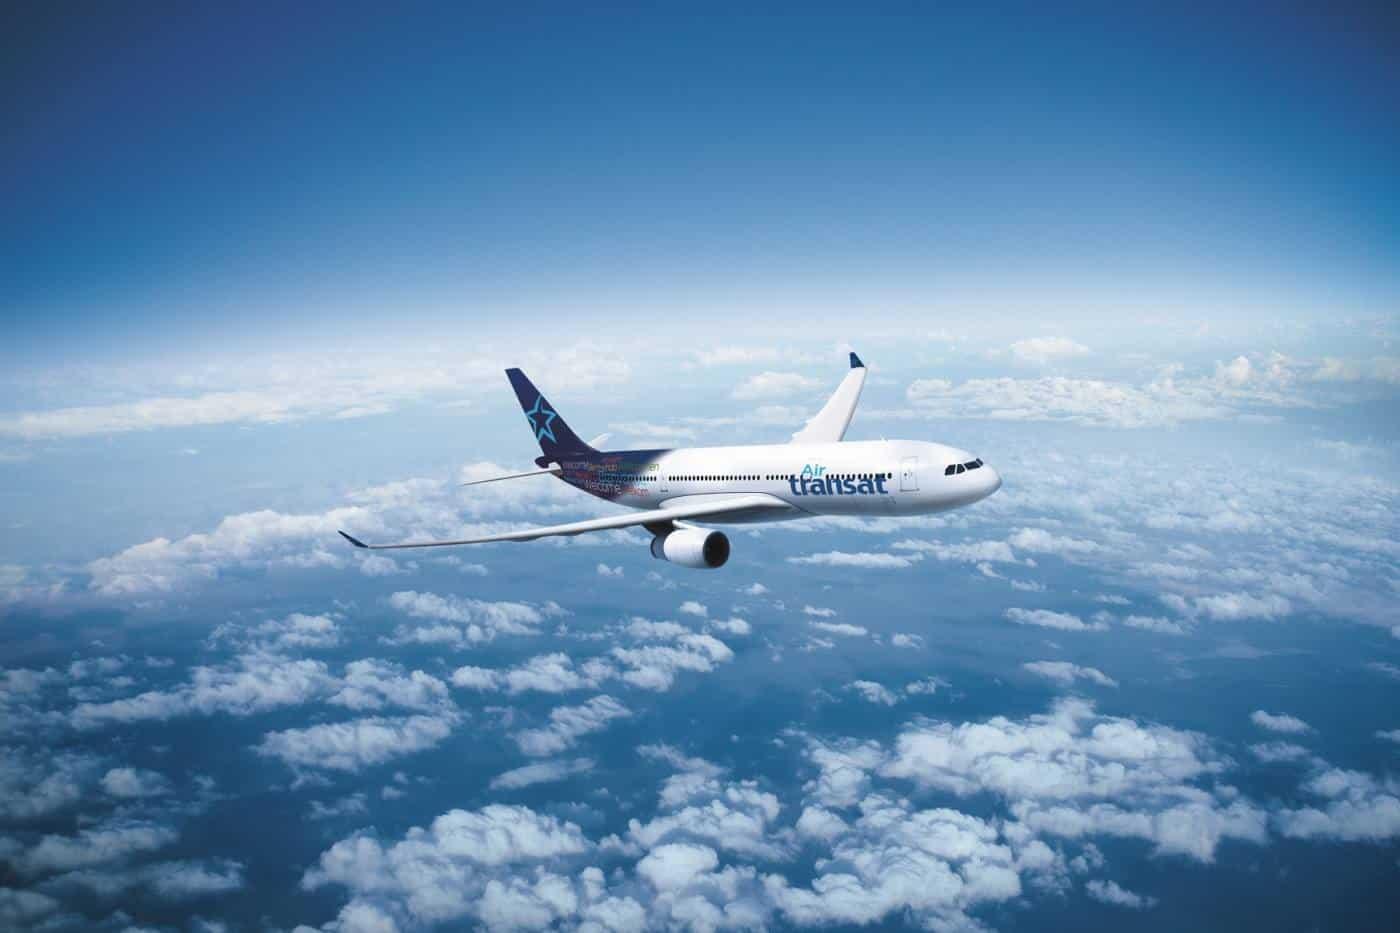 Air Transat Club Class Vs Premium Economy Alajode Travel Blog